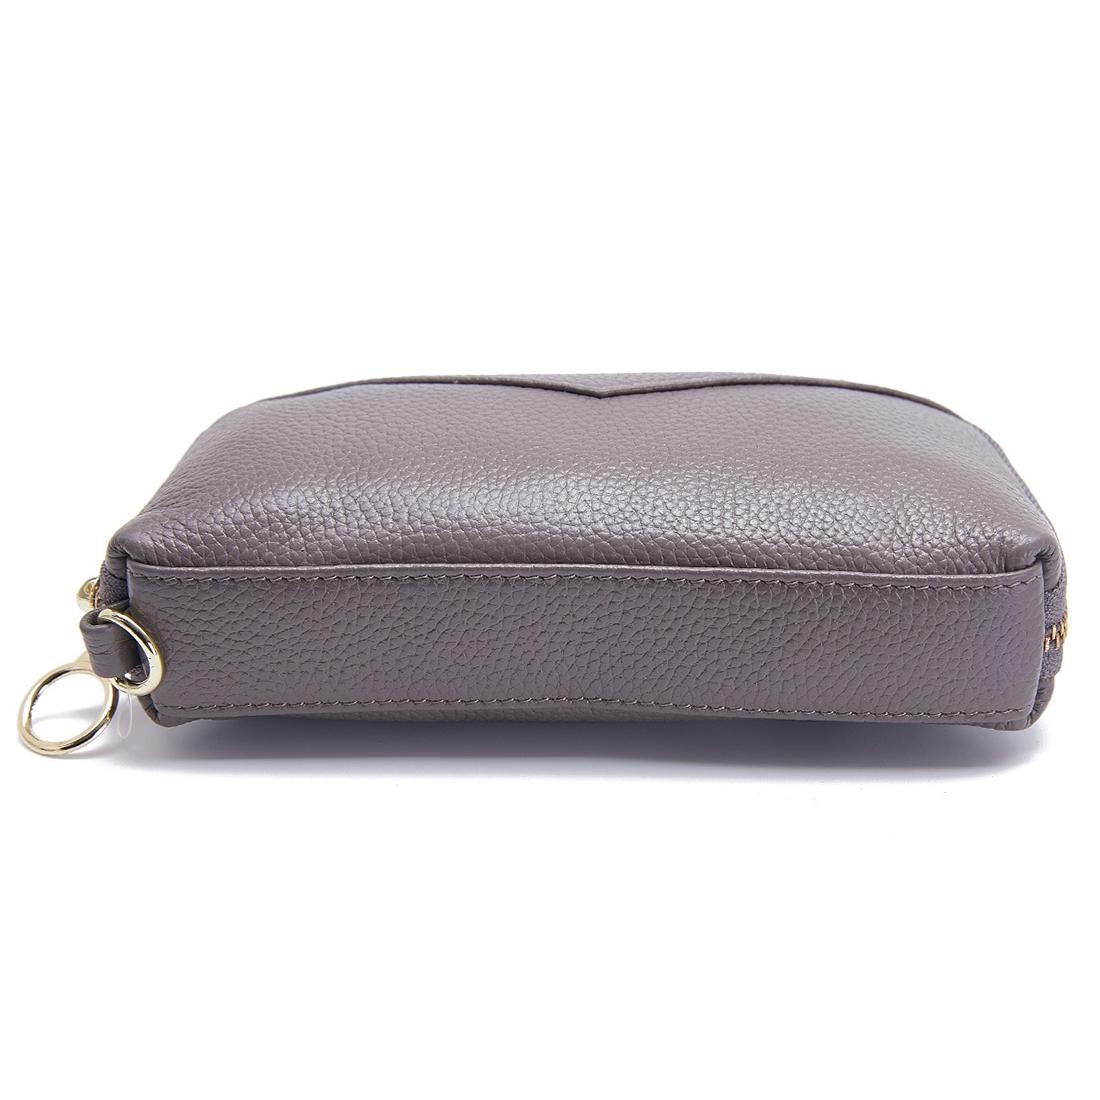 2-Folding Square Genuine Leather Handbag (Grey)